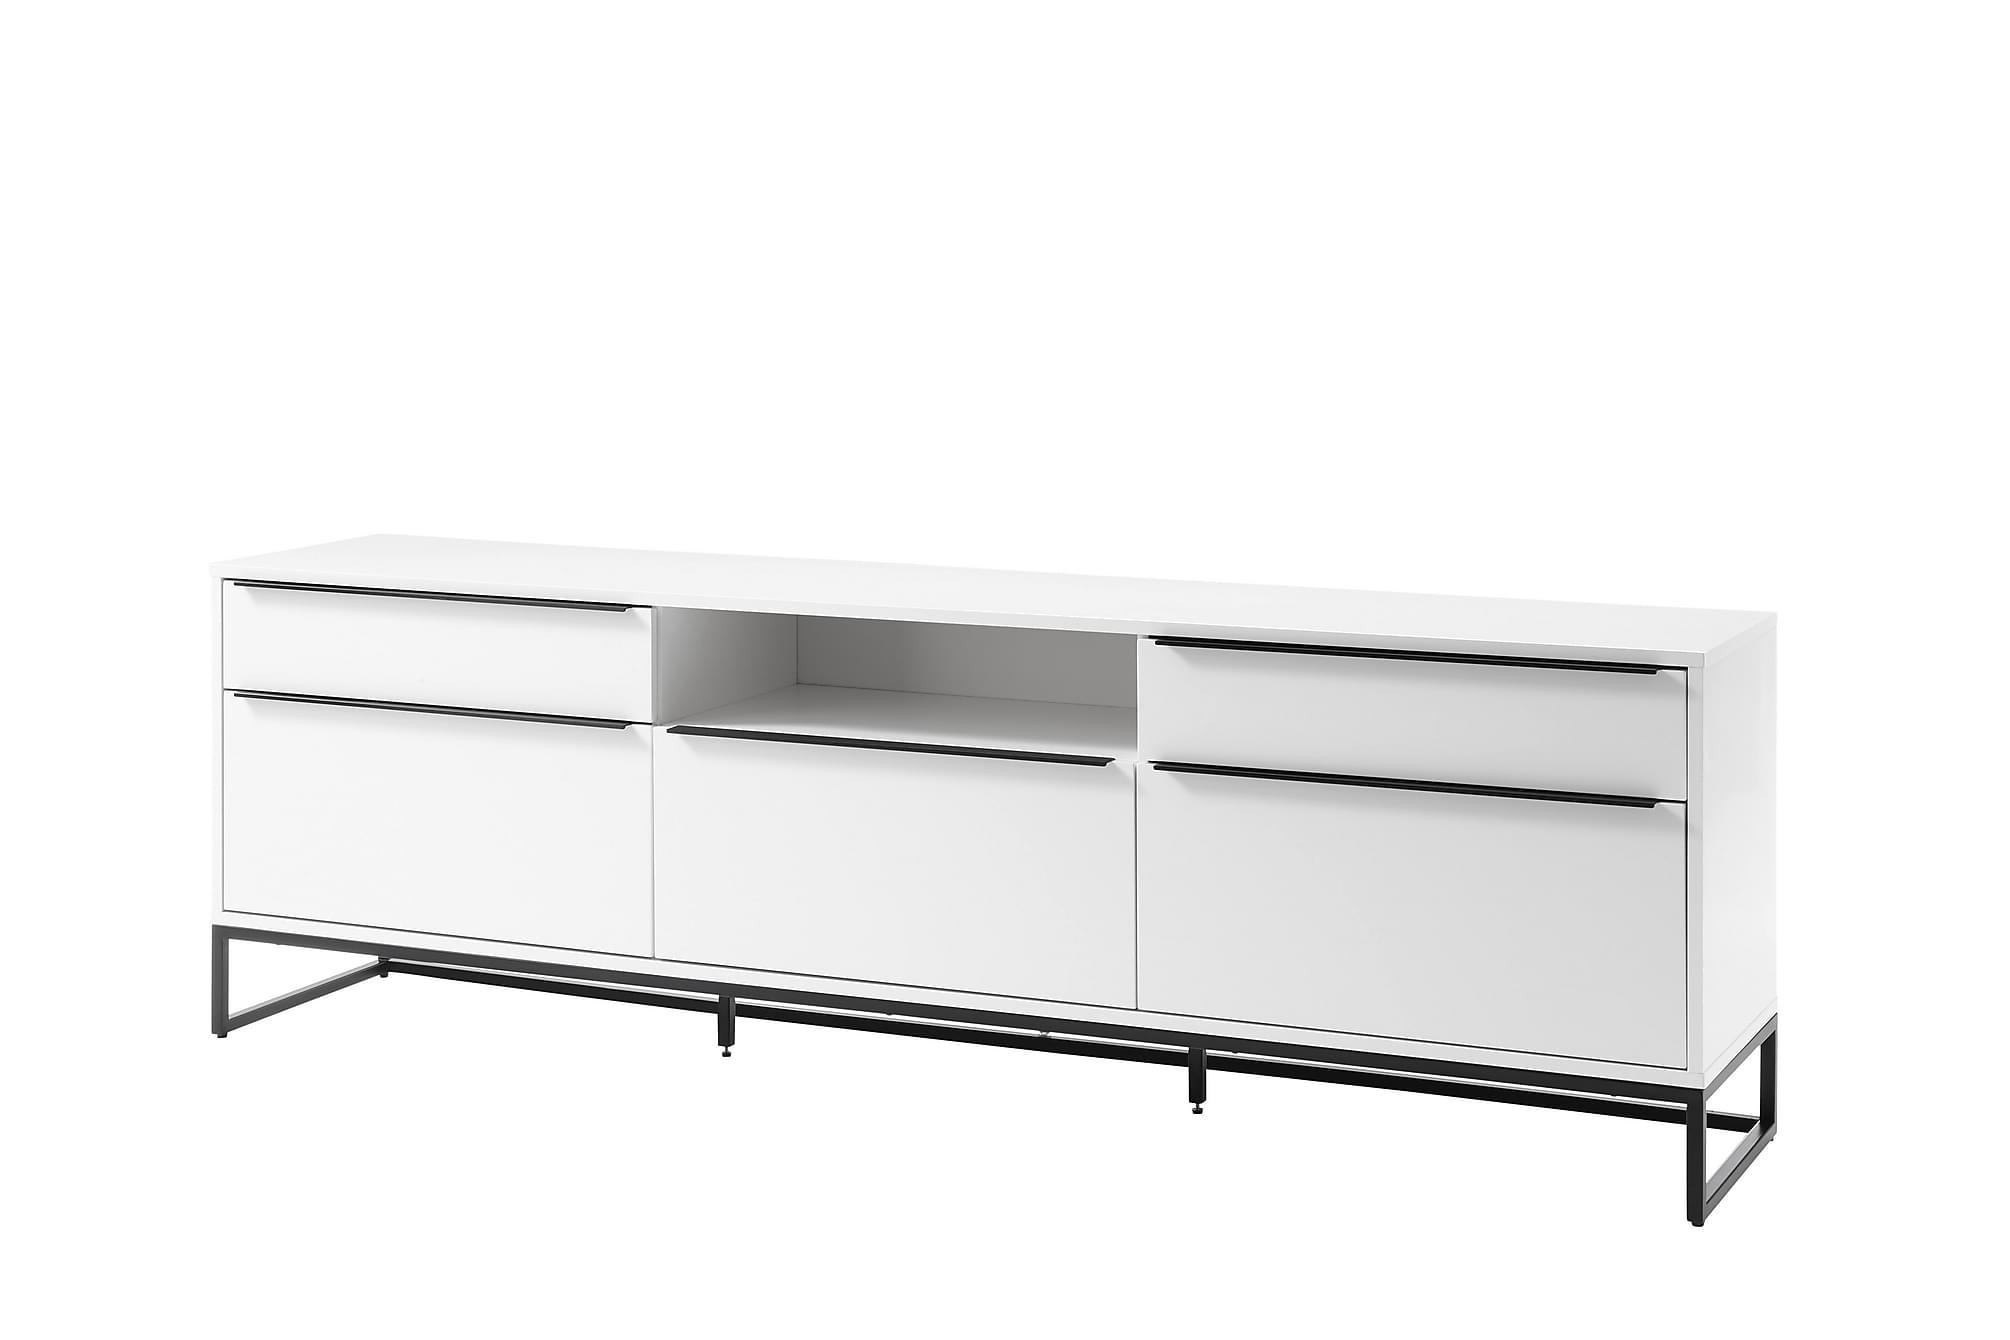 AGURKIS Lowboard 215 cm Vit|Svart, Sideboards